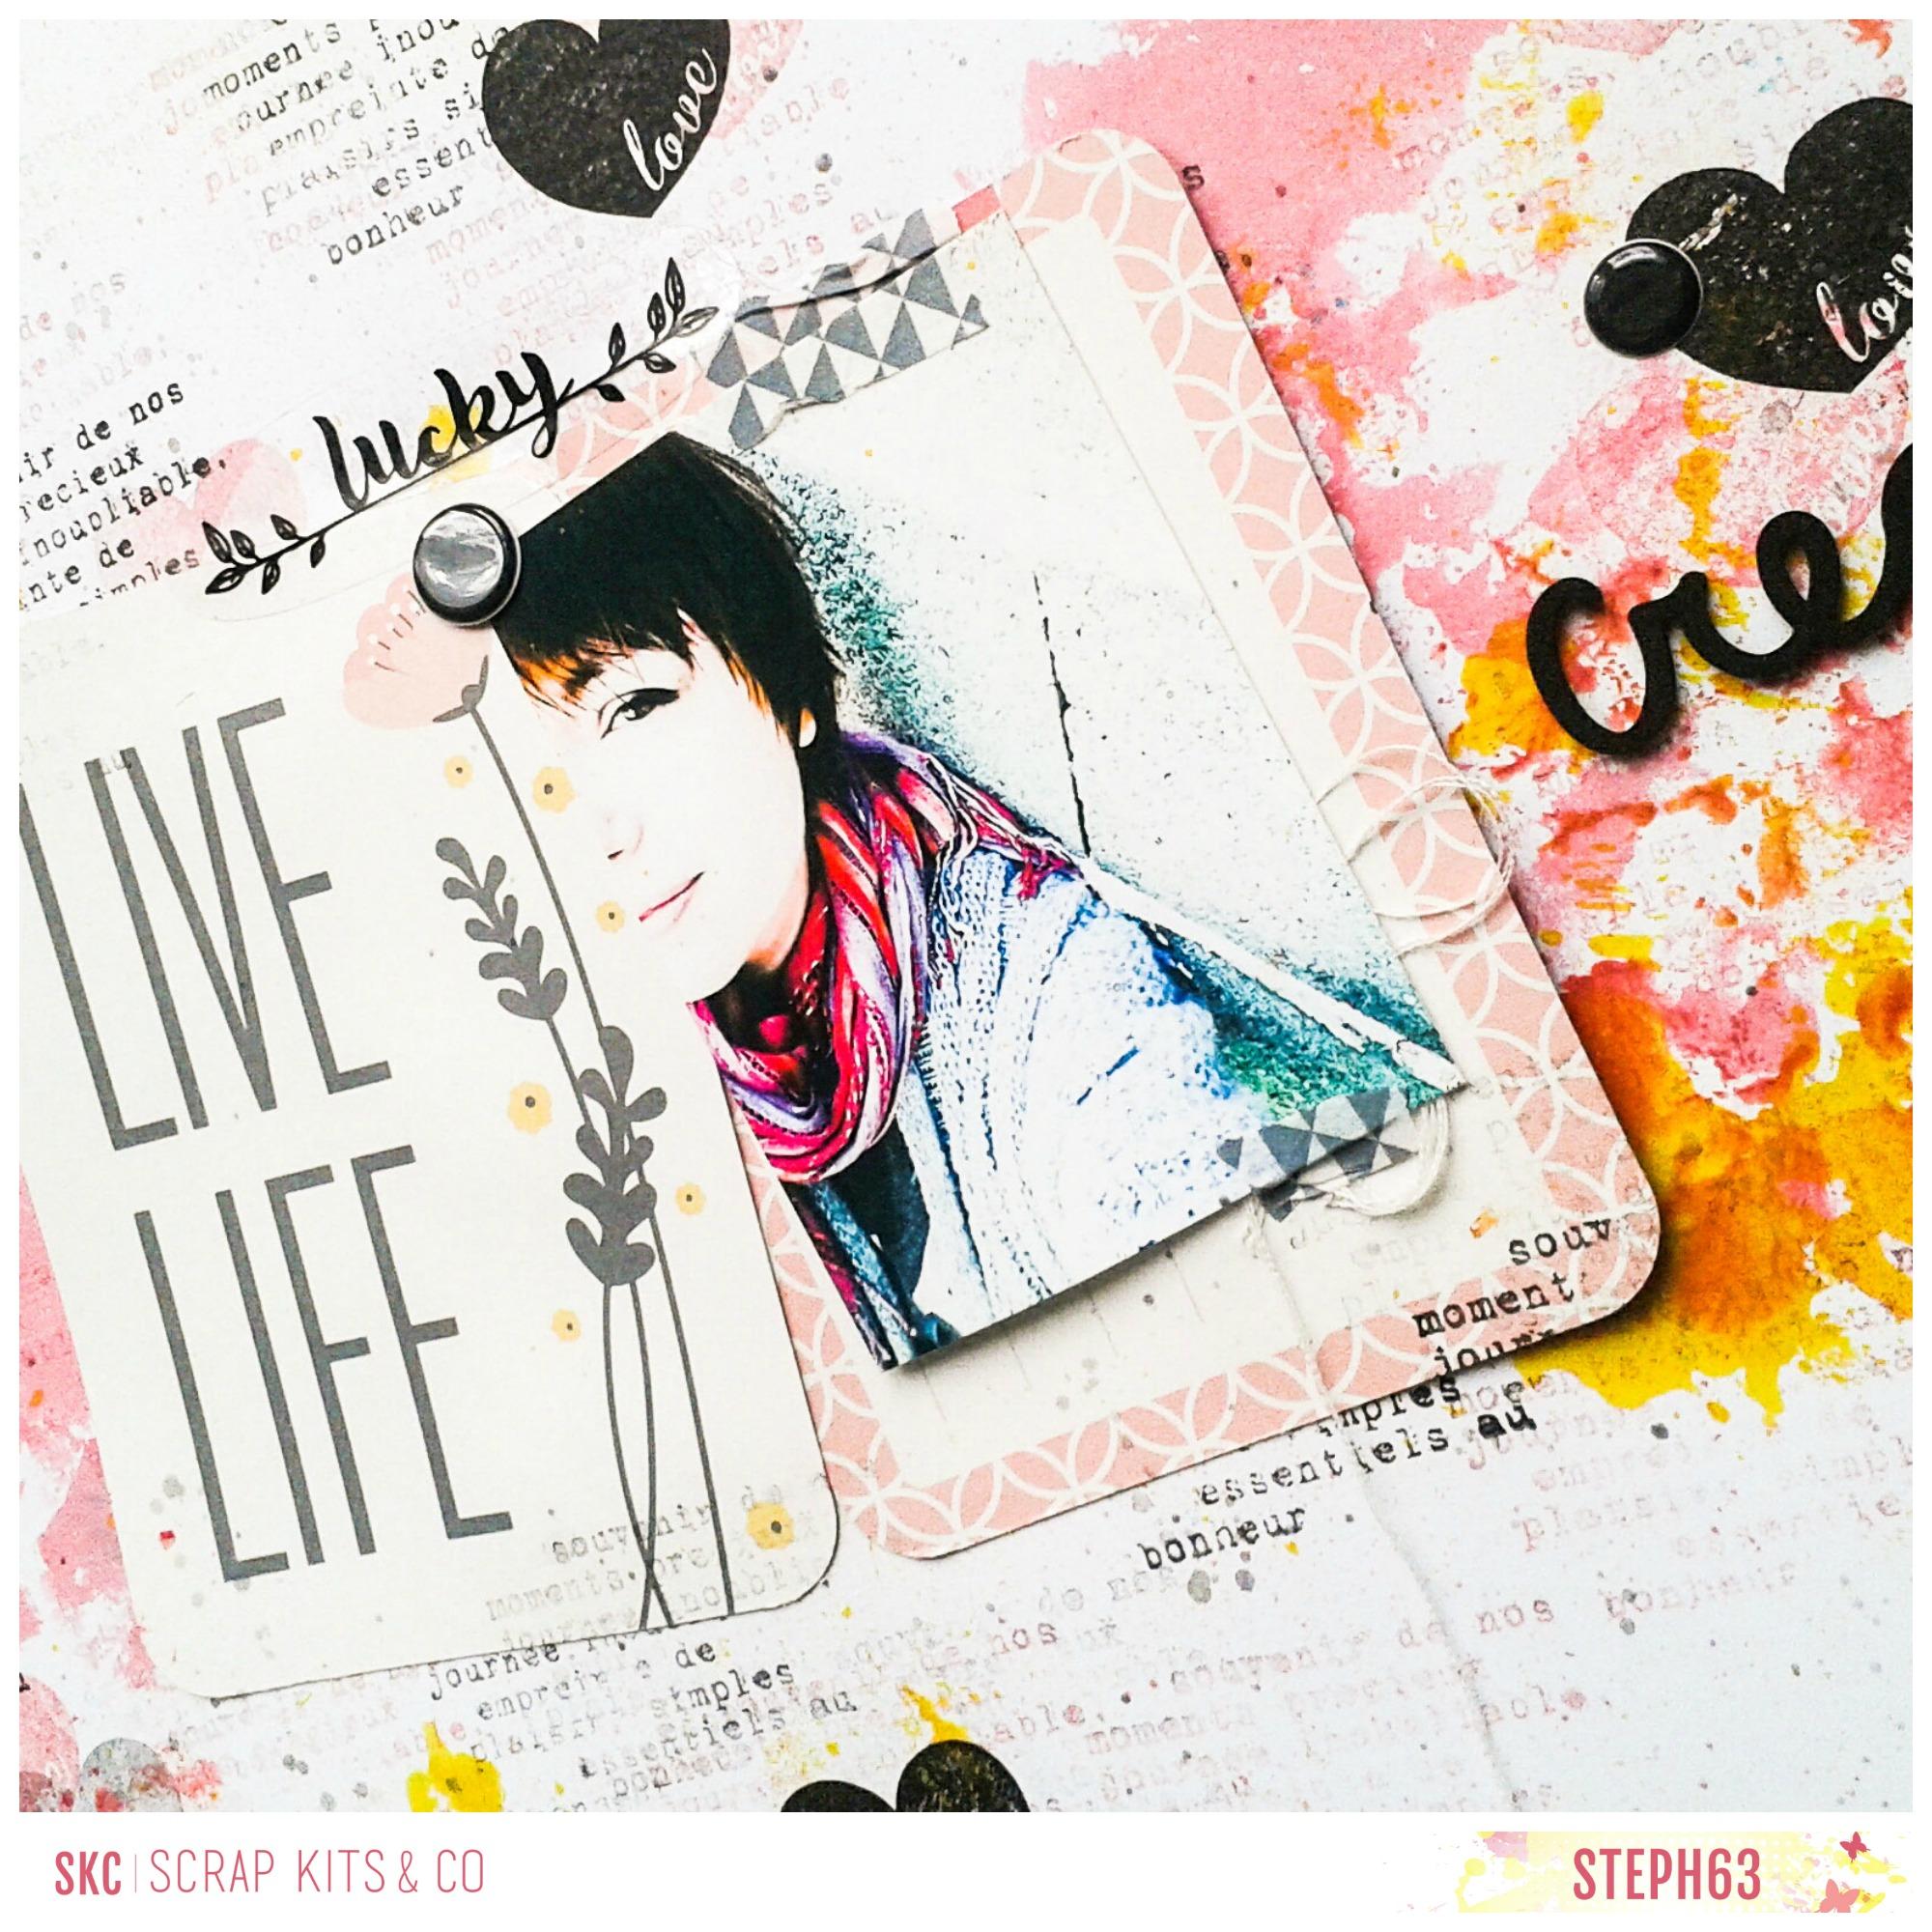 life, live, create